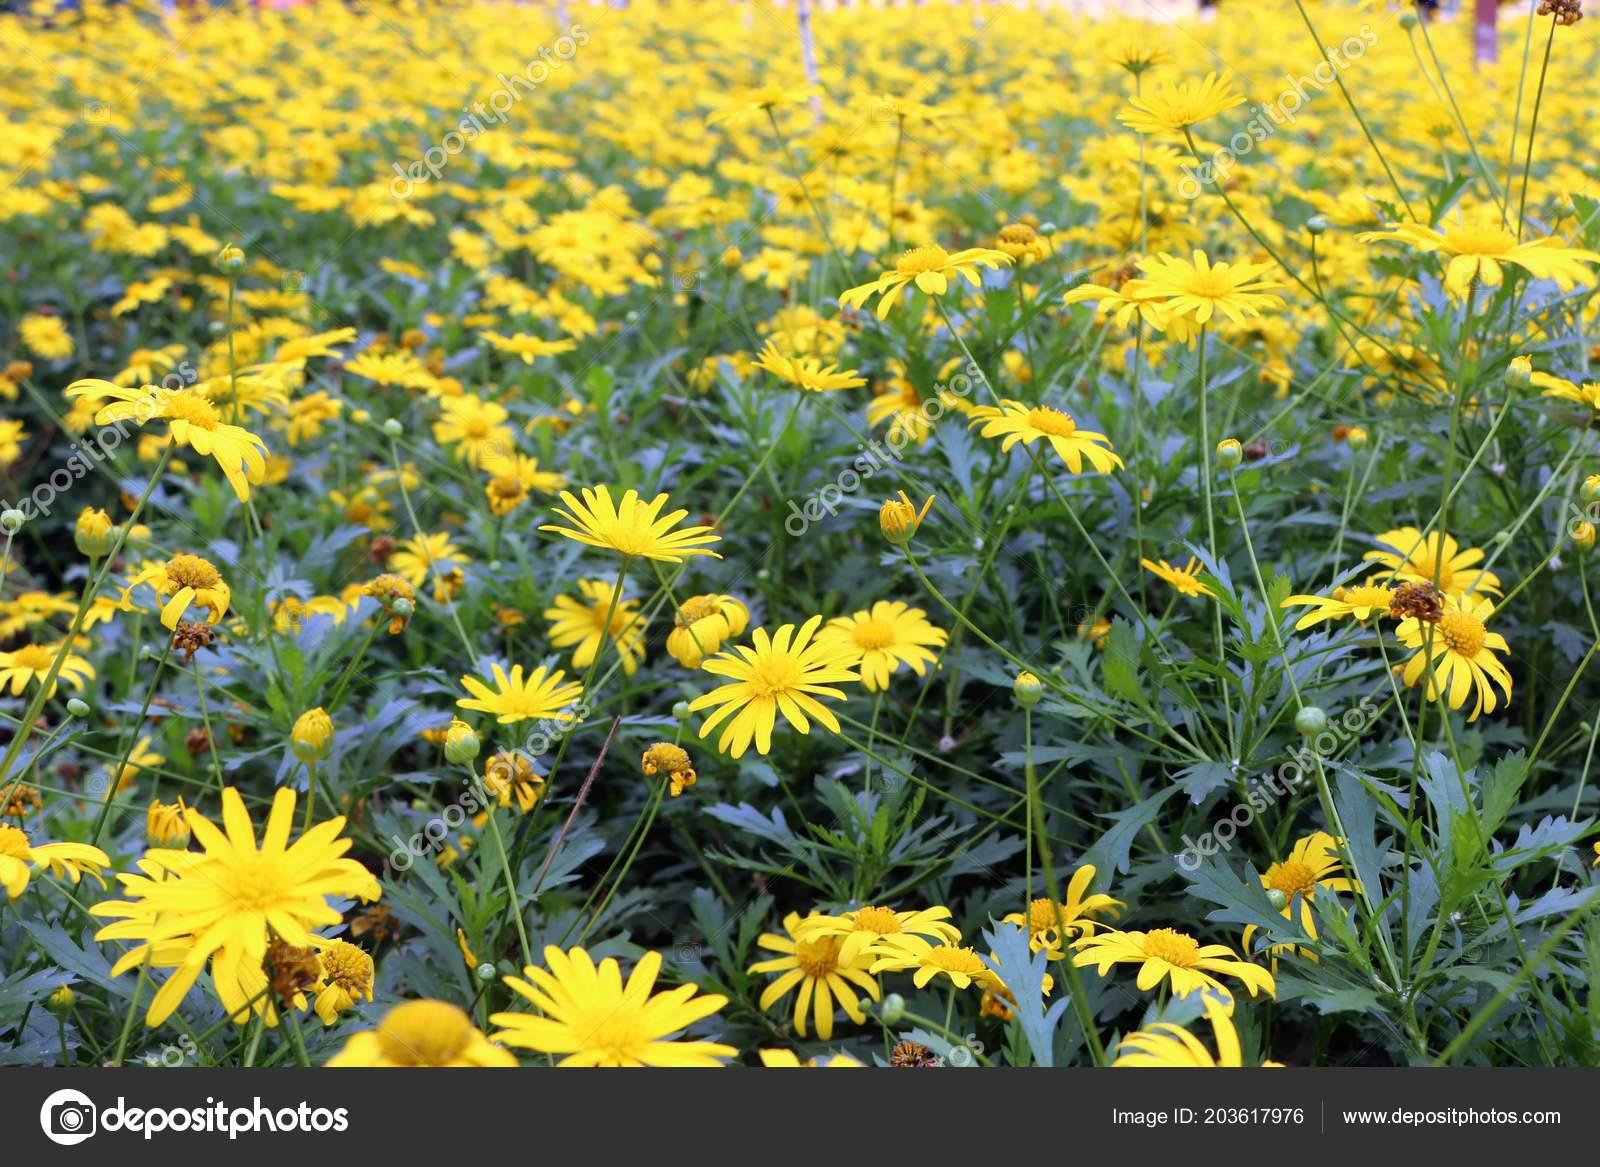 Beautiful yellow spring flowers garden stock photo razihusin beautiful yellow spring flowers garden stock photo izmirmasajfo